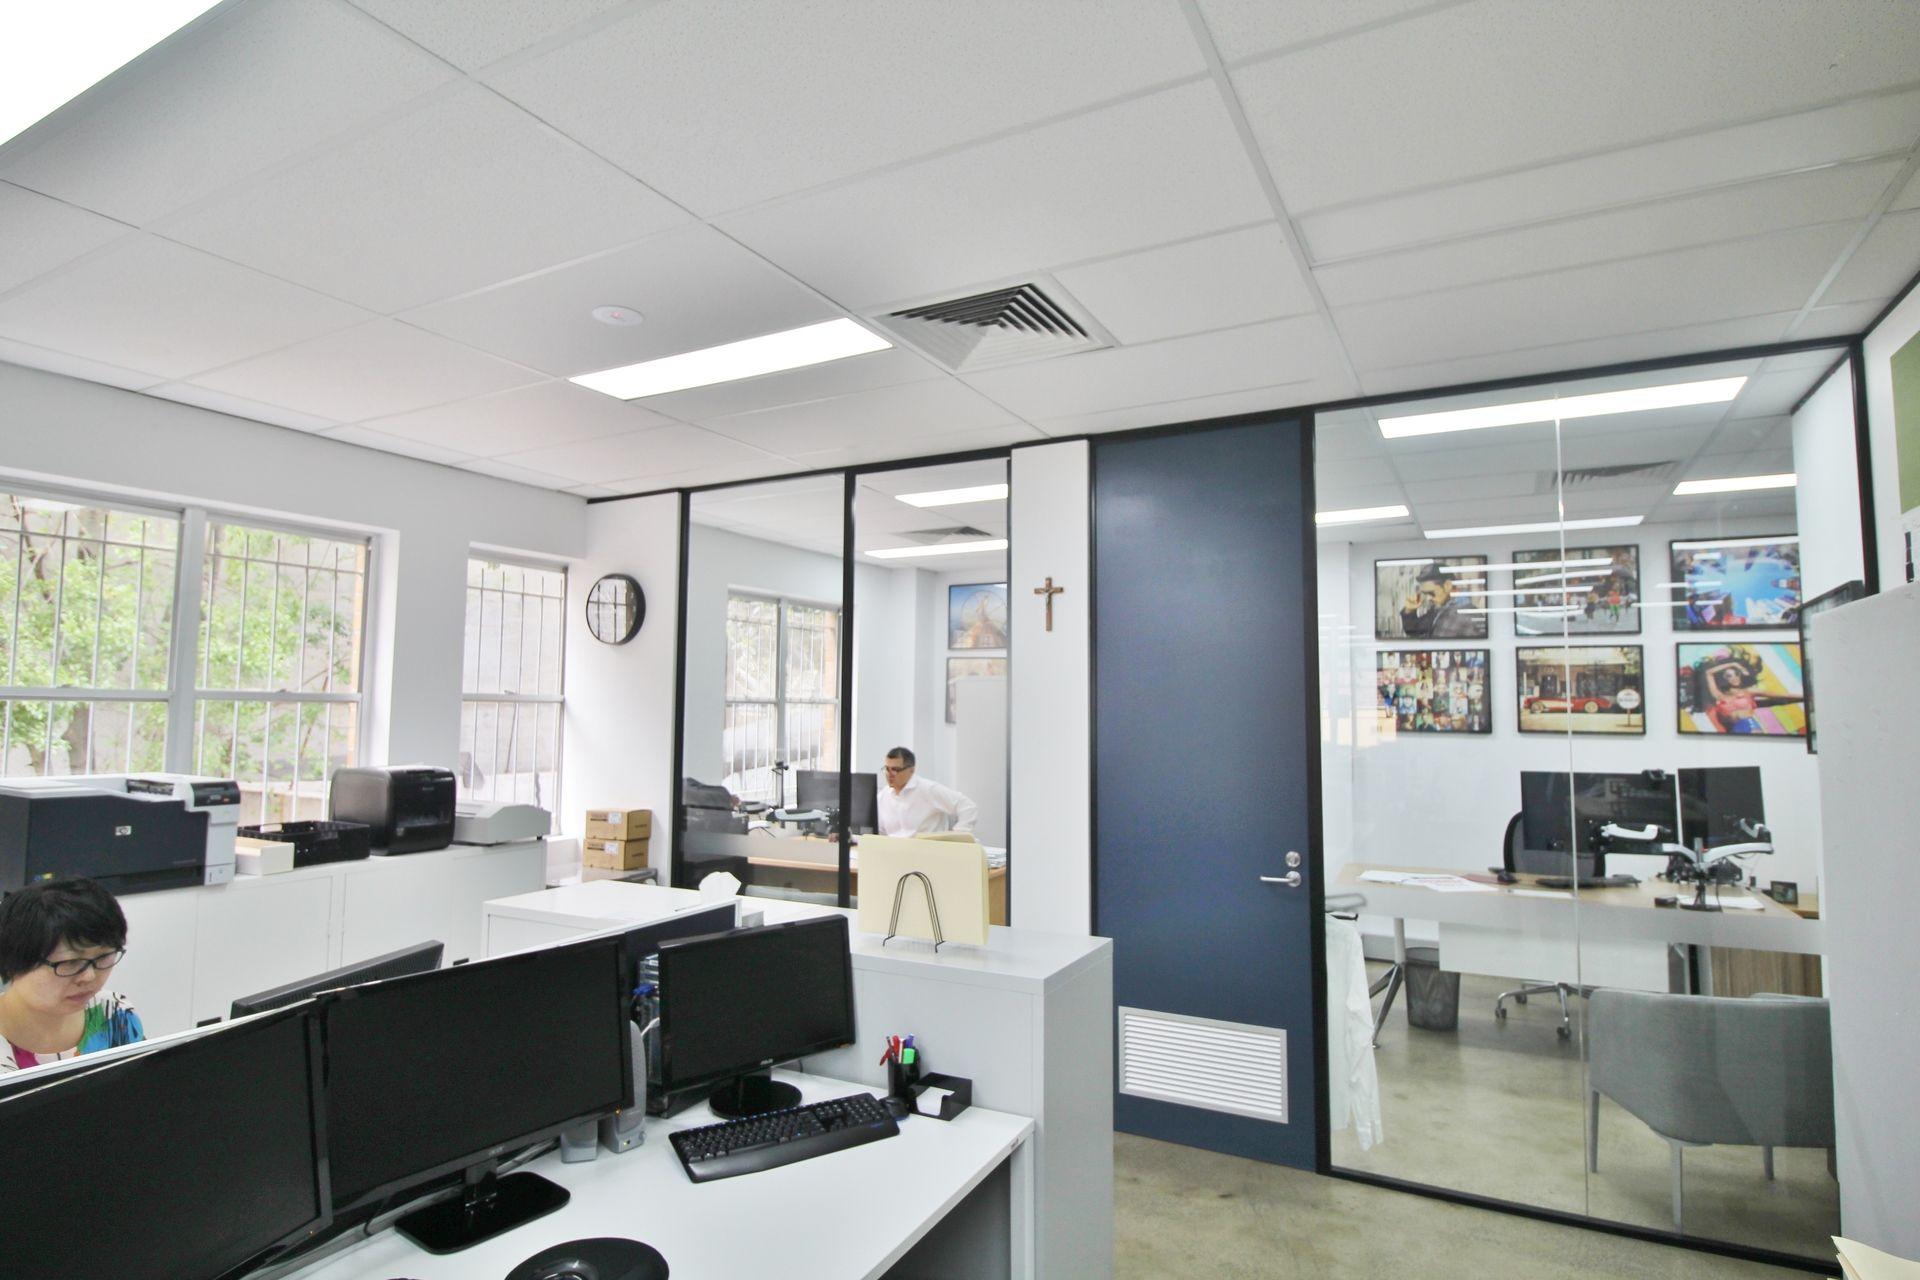 CONTEMPORARY CREATIVE OFFICE